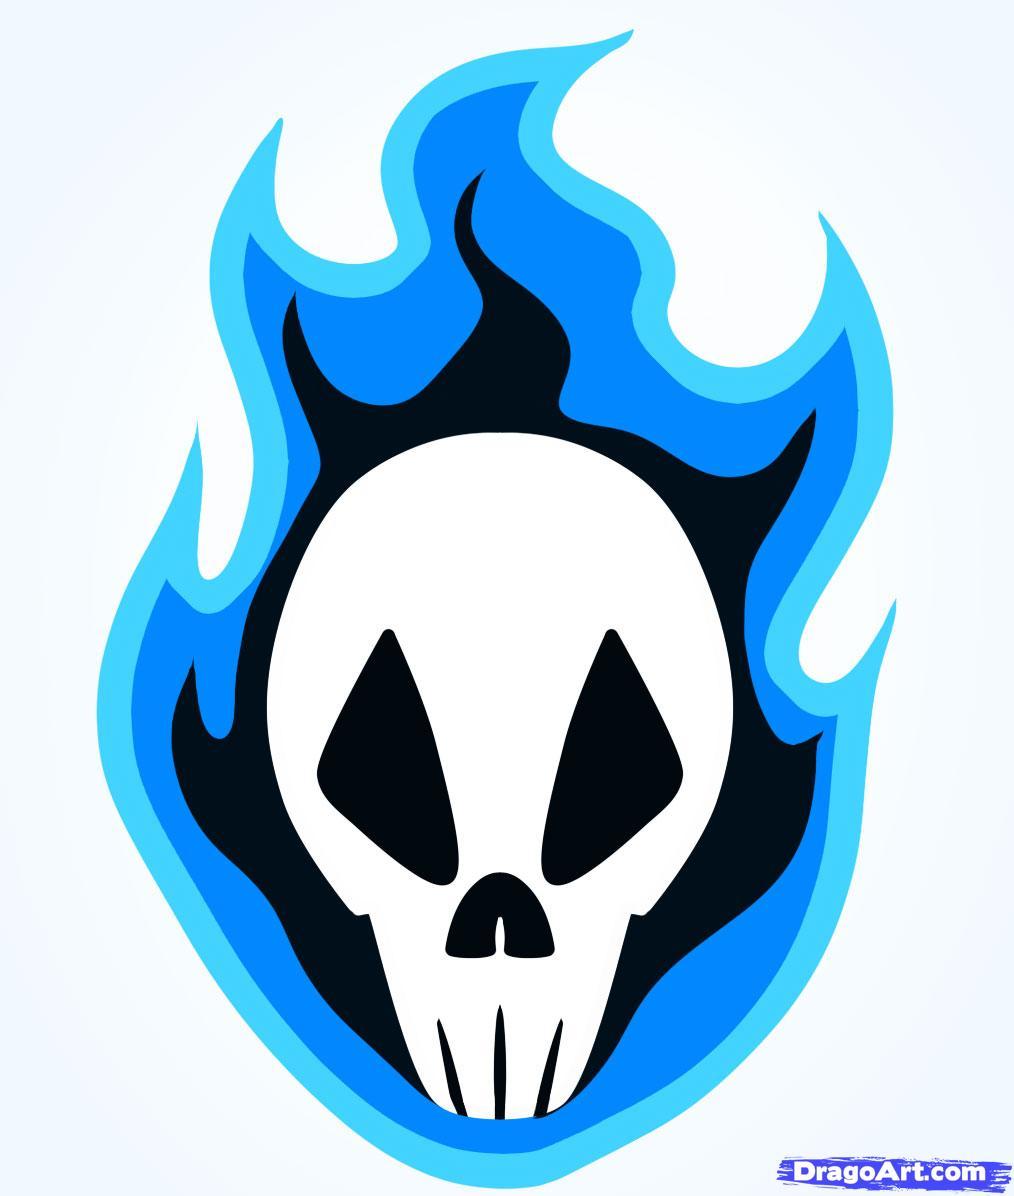 Drawn skull anime Free how%20to%20draw%20cartoon%20fire%20flames Flames To Panda